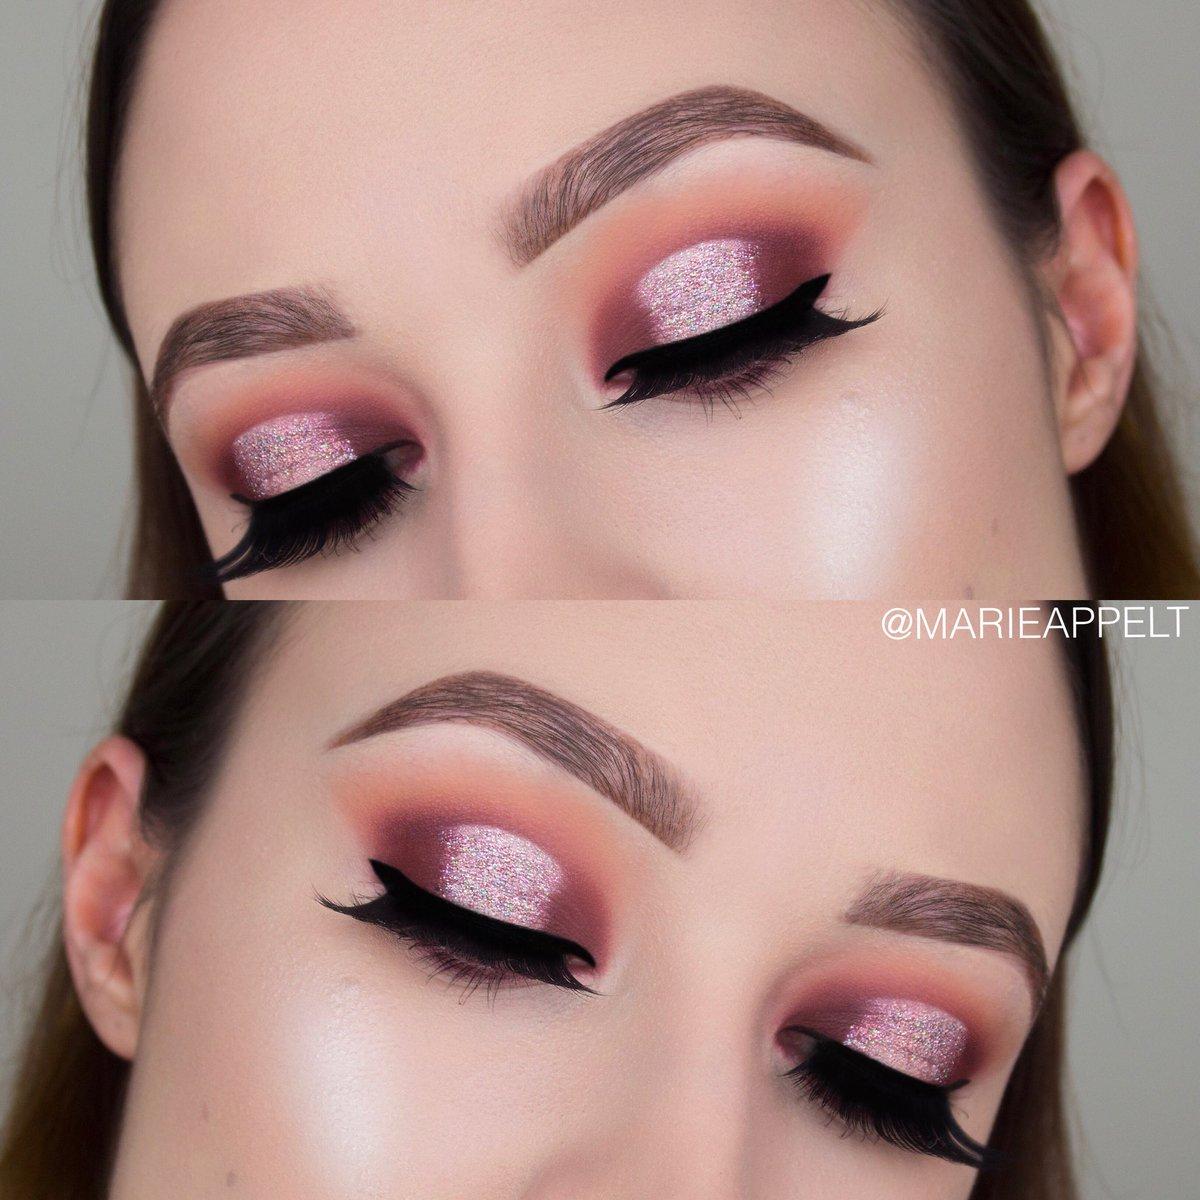 "marie appelt makeup on twitter: ""pink holographic glitter spotlight"